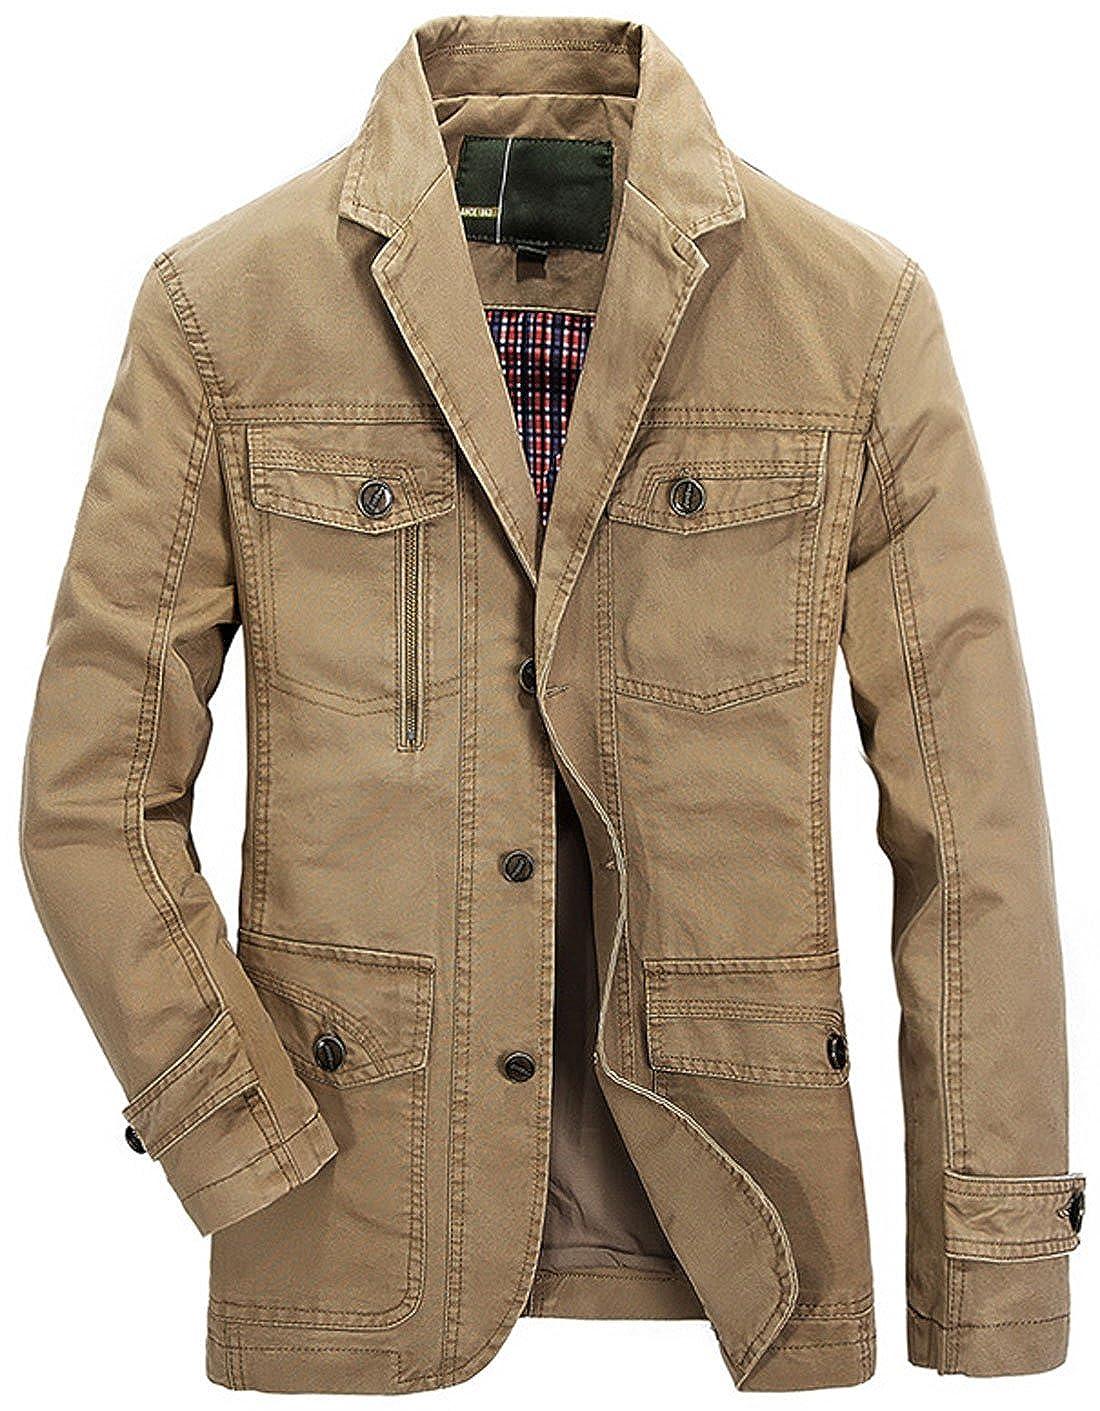 Chouyatou Men's Casual Notched Collar Multi Pockets 3 Buttons Lightweight Blazer Jackets